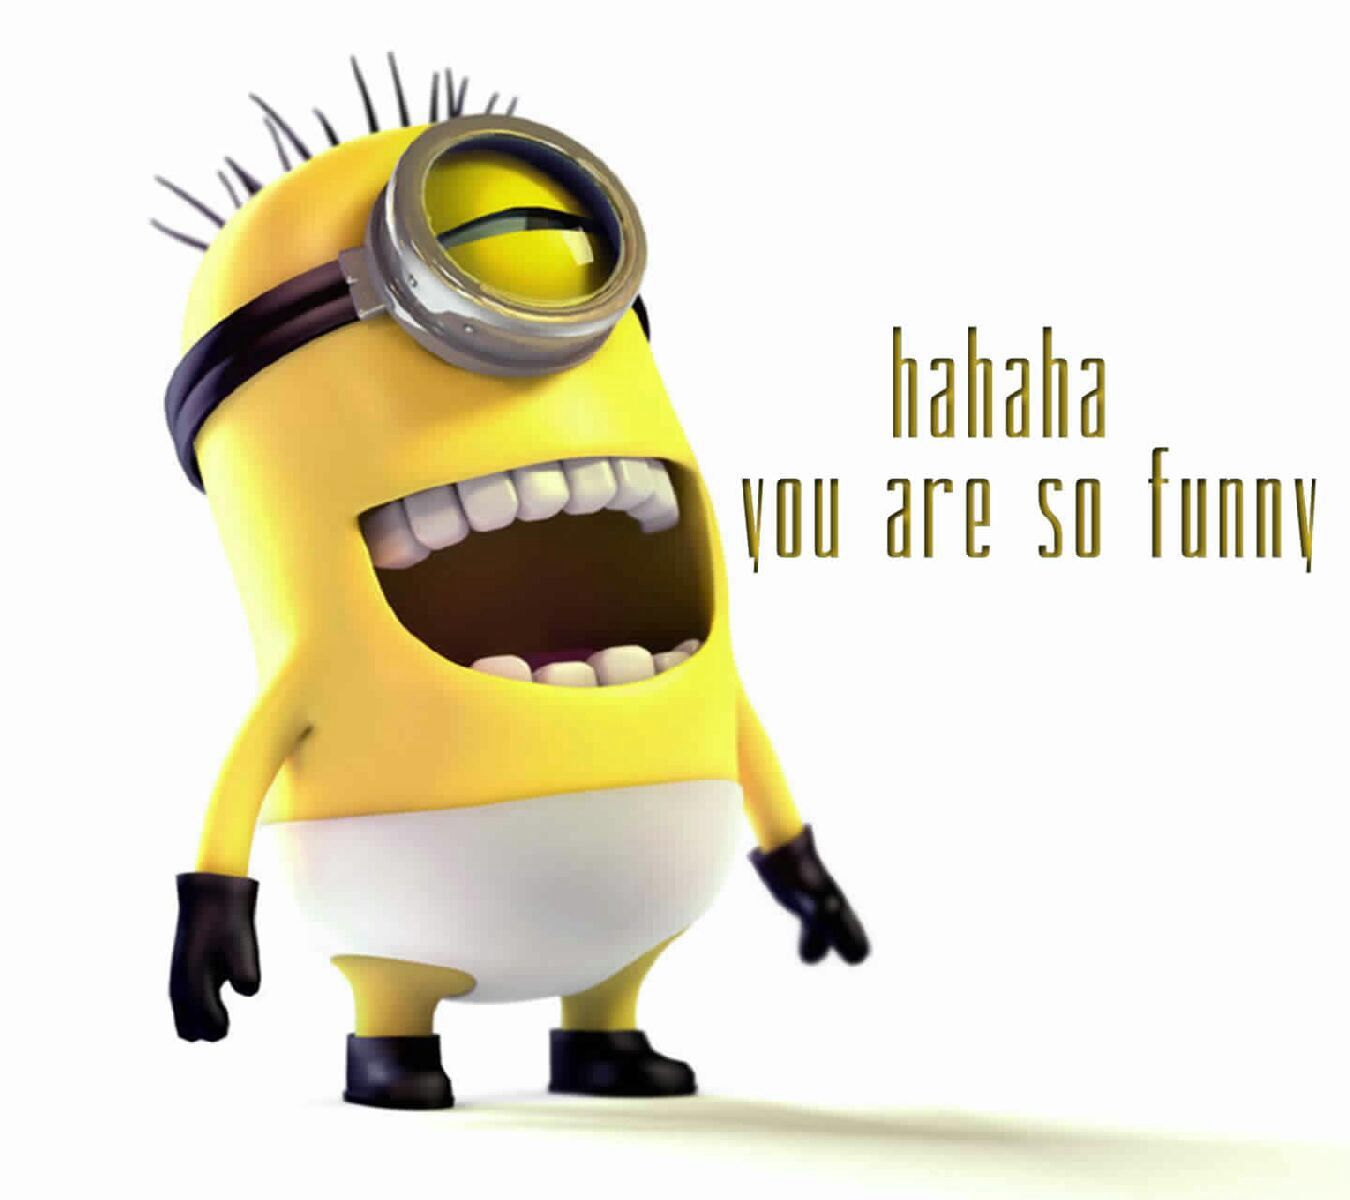 Minion. haha you are so funny!! | Minions | Minions ...